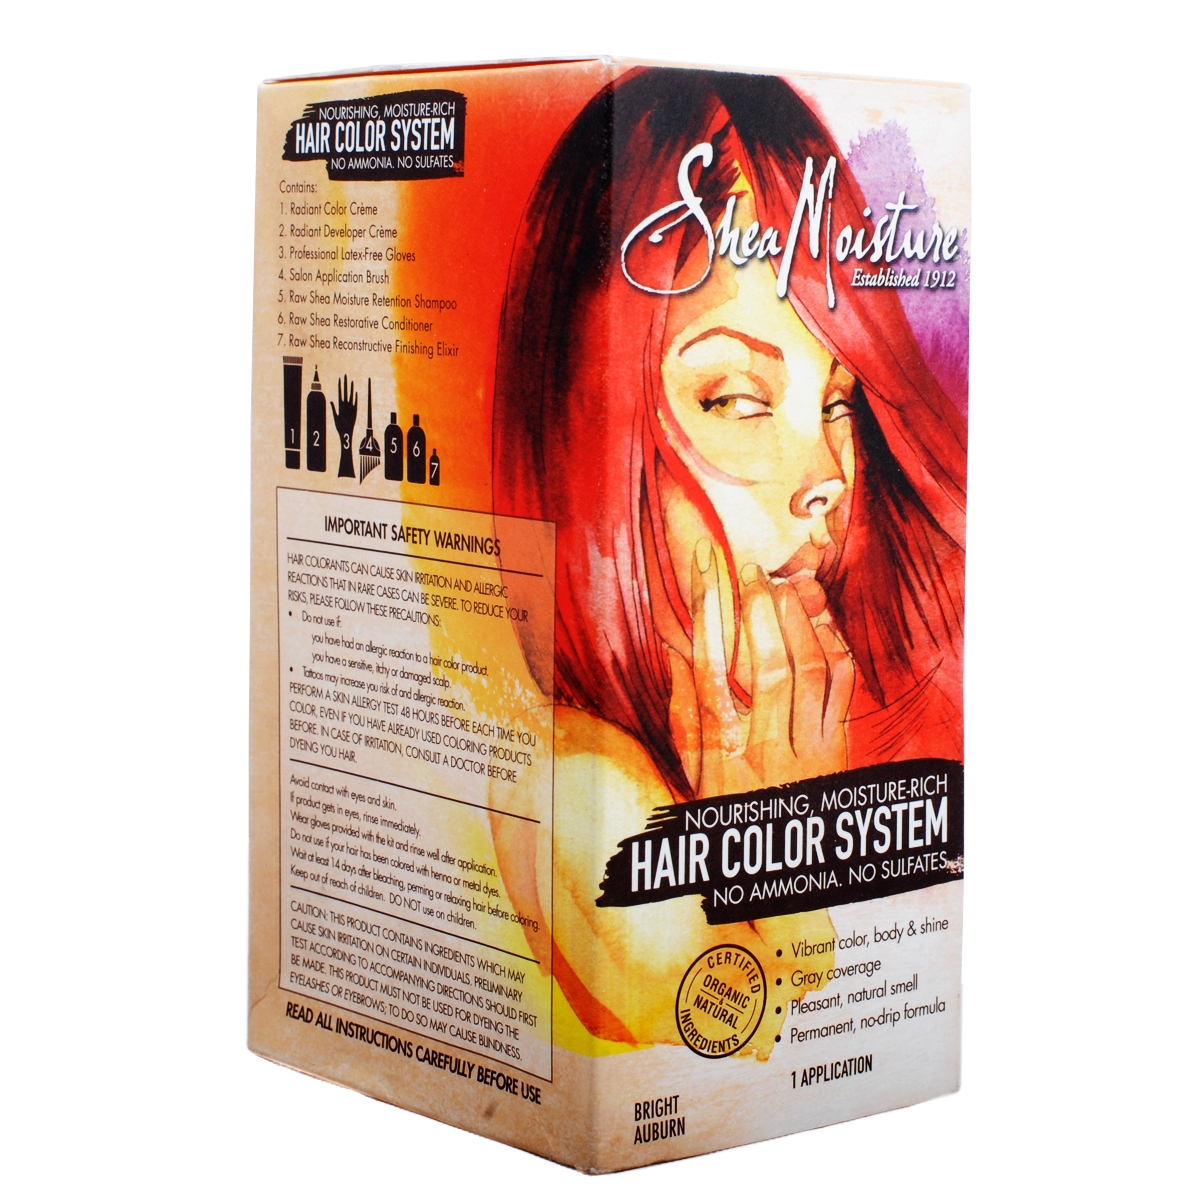 Shea Moisture Hair Color System Dark Auburn 2018 Images Pictures